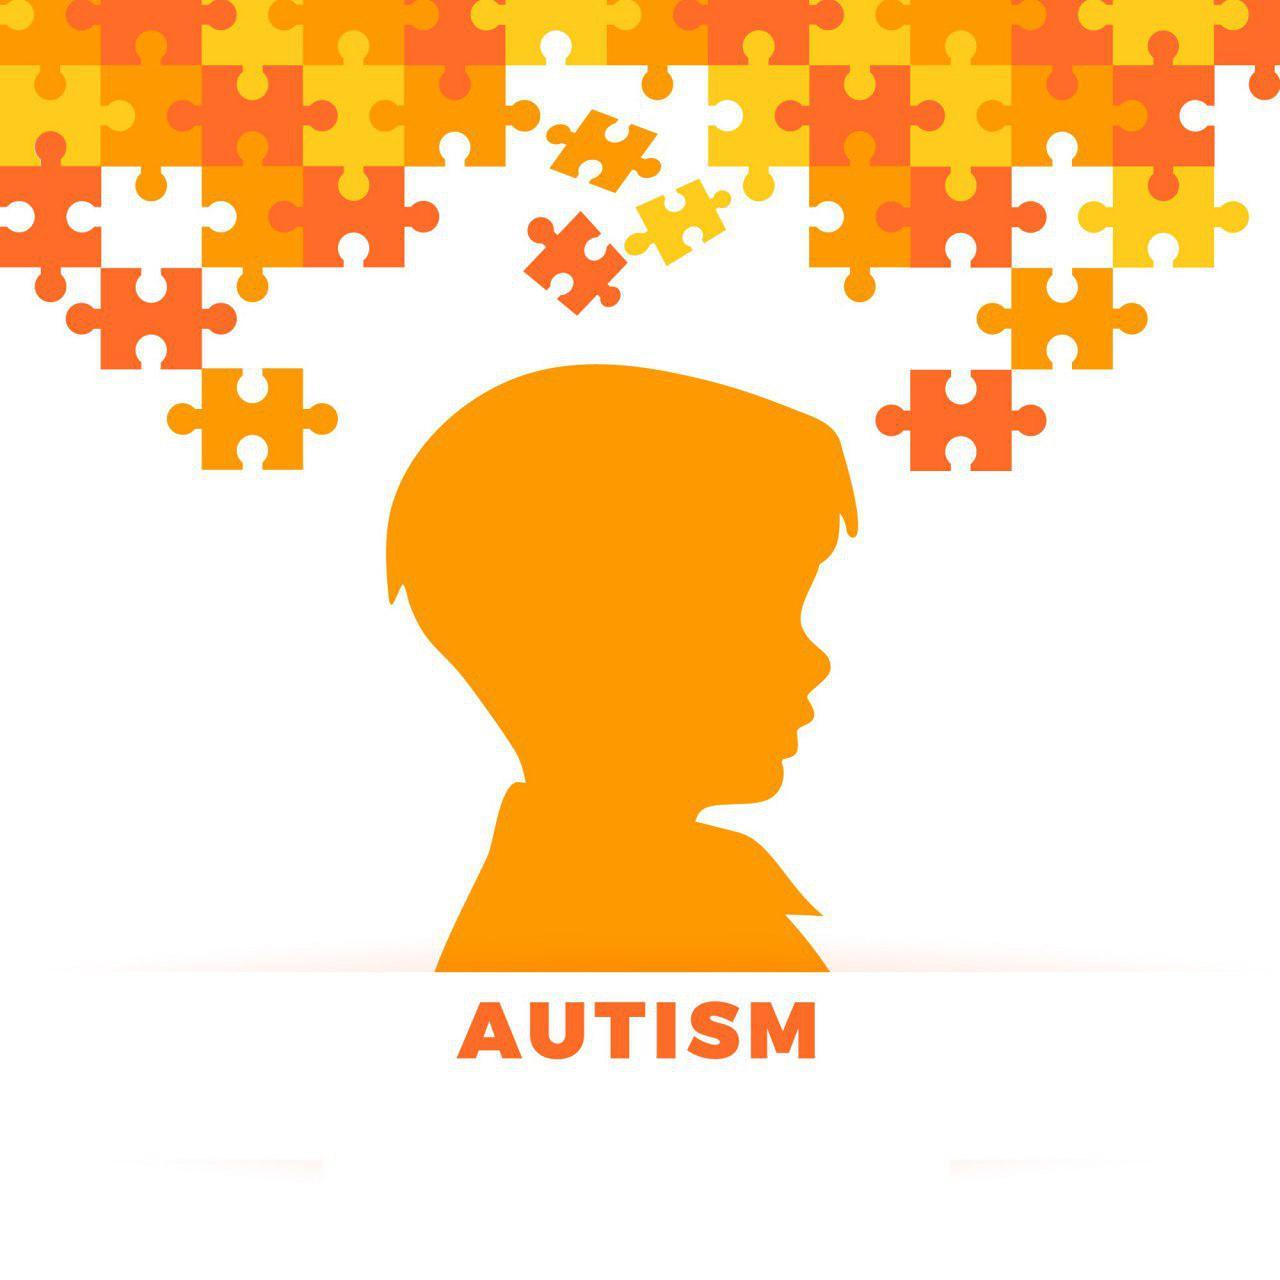 Autism Treatment with Stem Cells